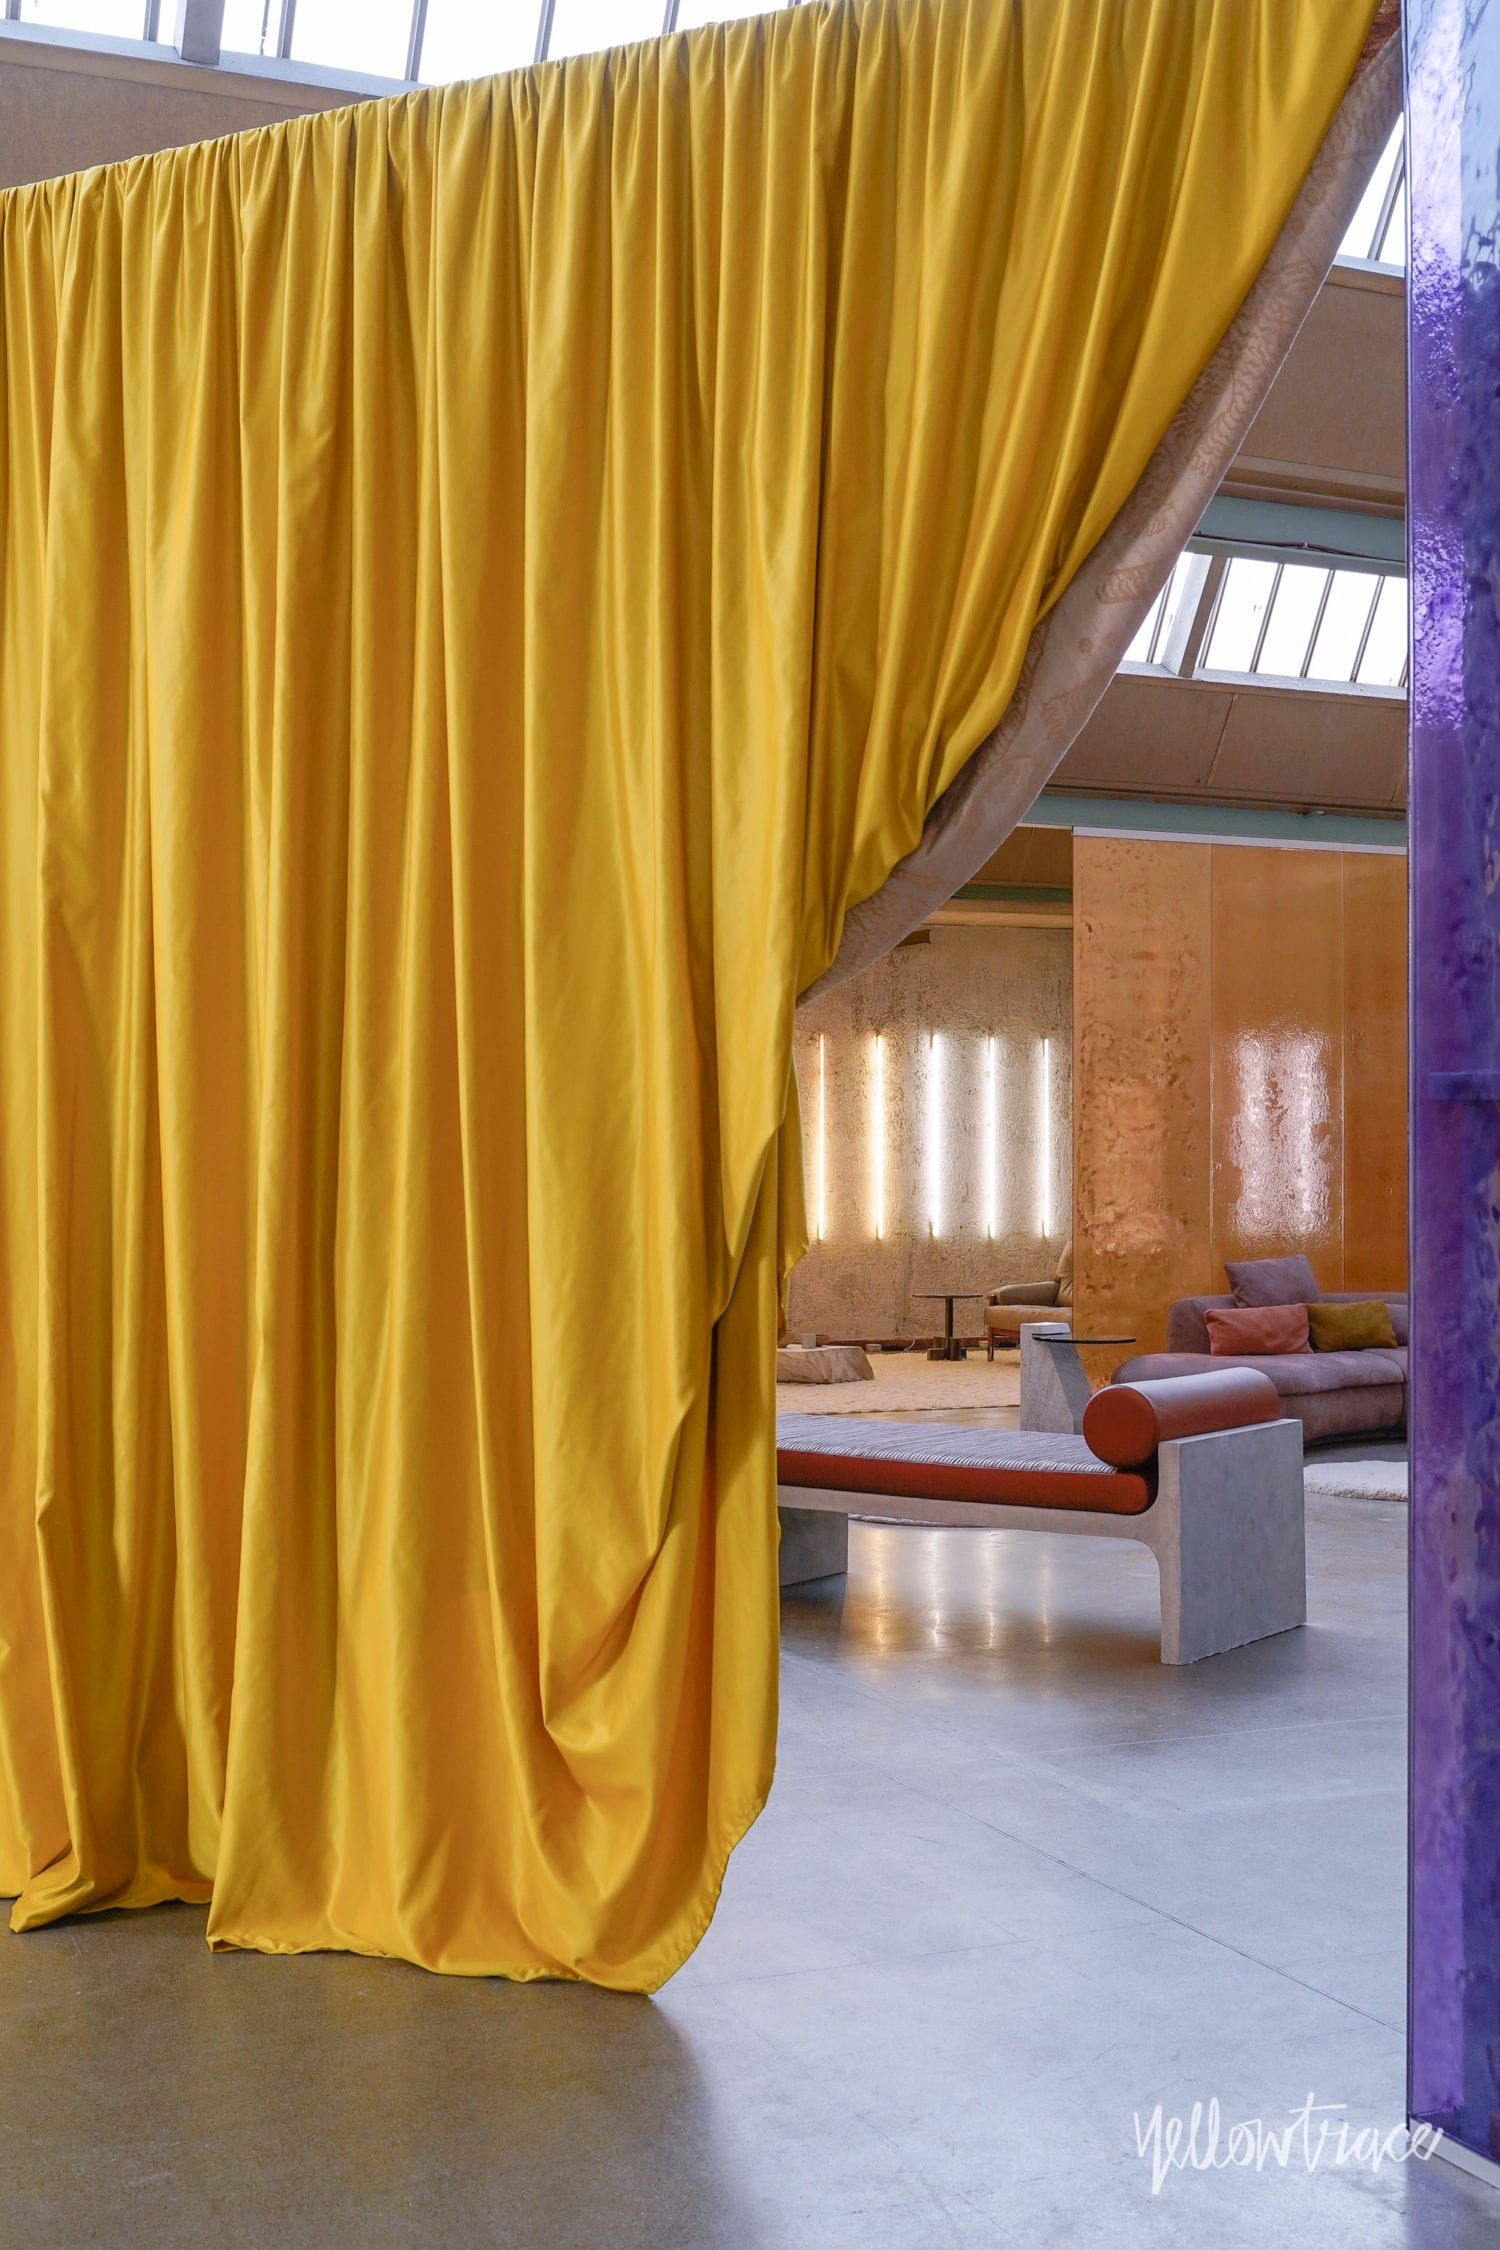 Les Arcanistes Studiopepe At Milan Design Week 2019 Photo Nick Hughes Yellowtrace 02